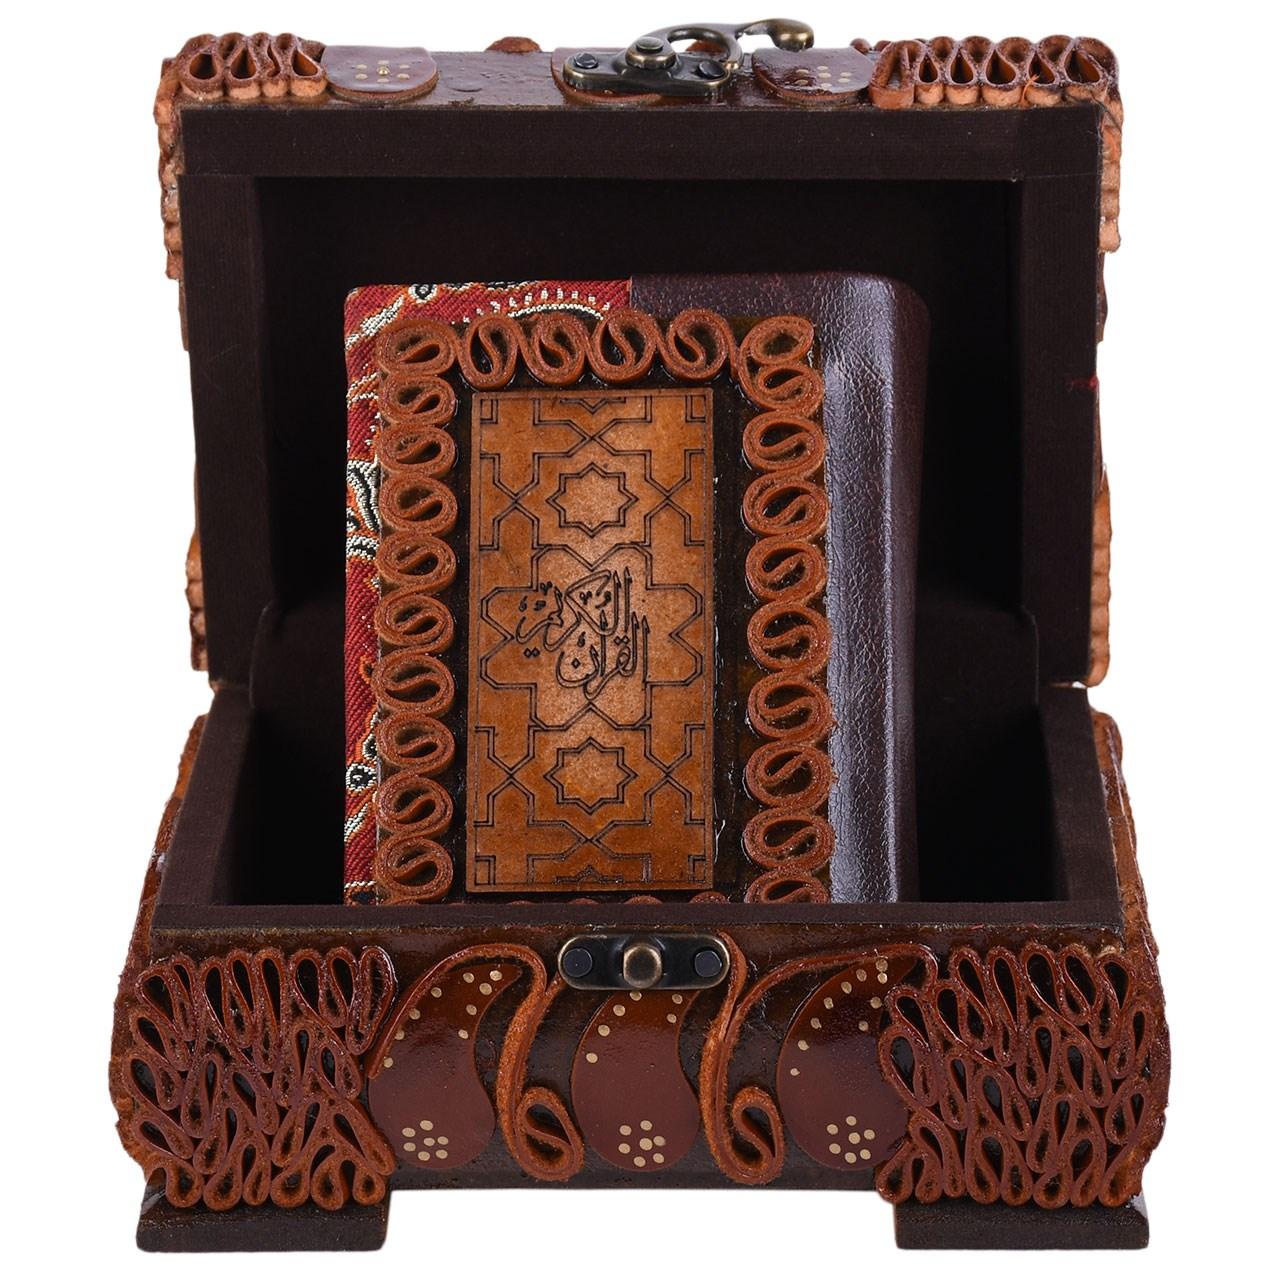 عکس جعبه قرآنی پایاچرم طرح چرم و ترمه مدل 04 سایز کوچک